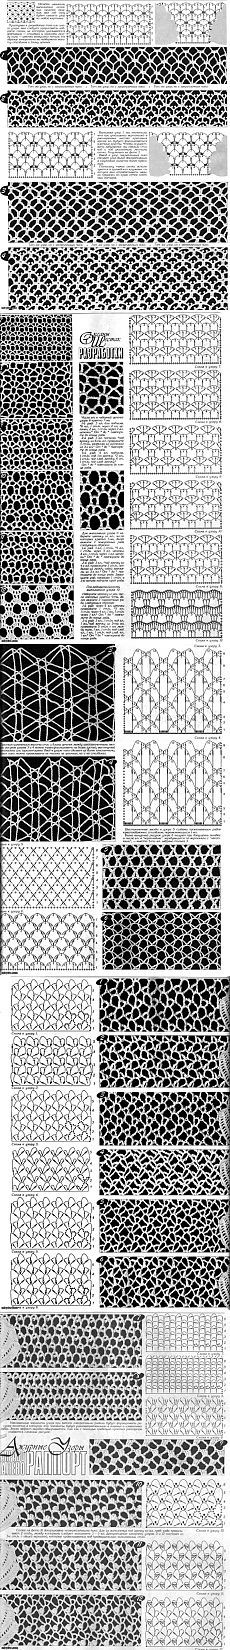 Grid hook örtü dantel file